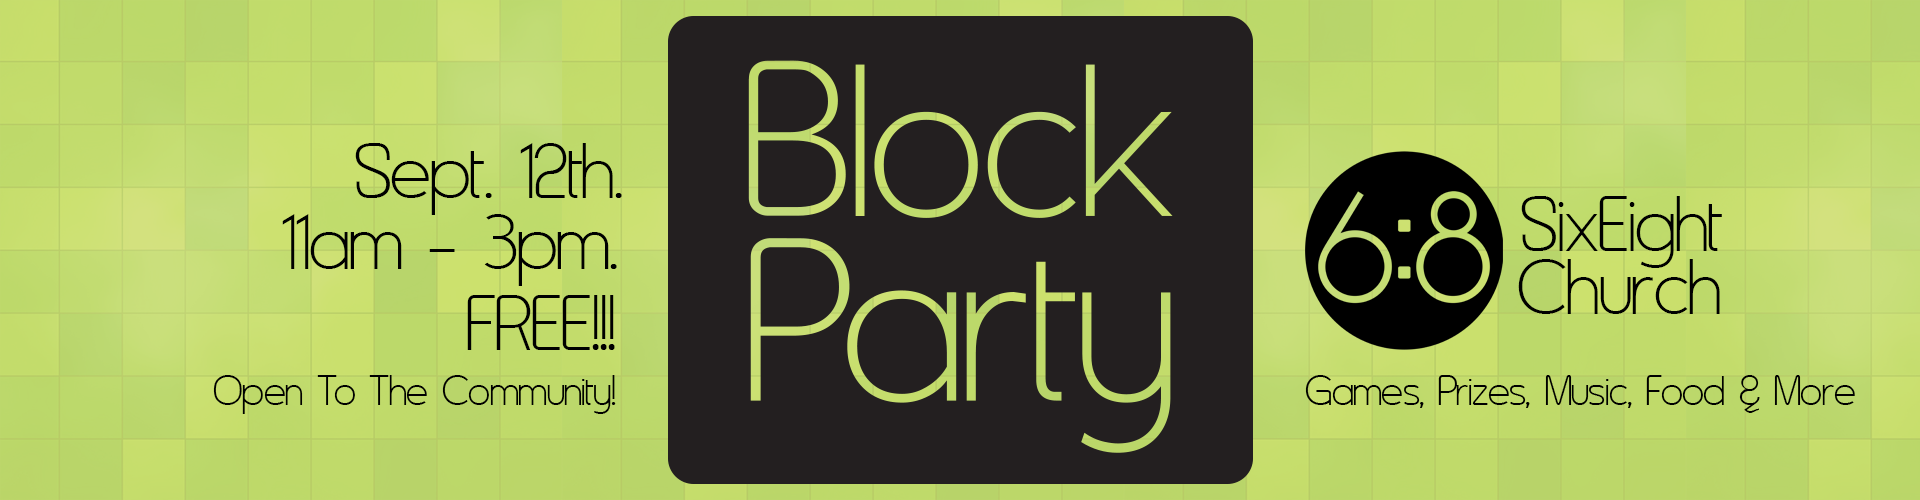 Block Party 2015